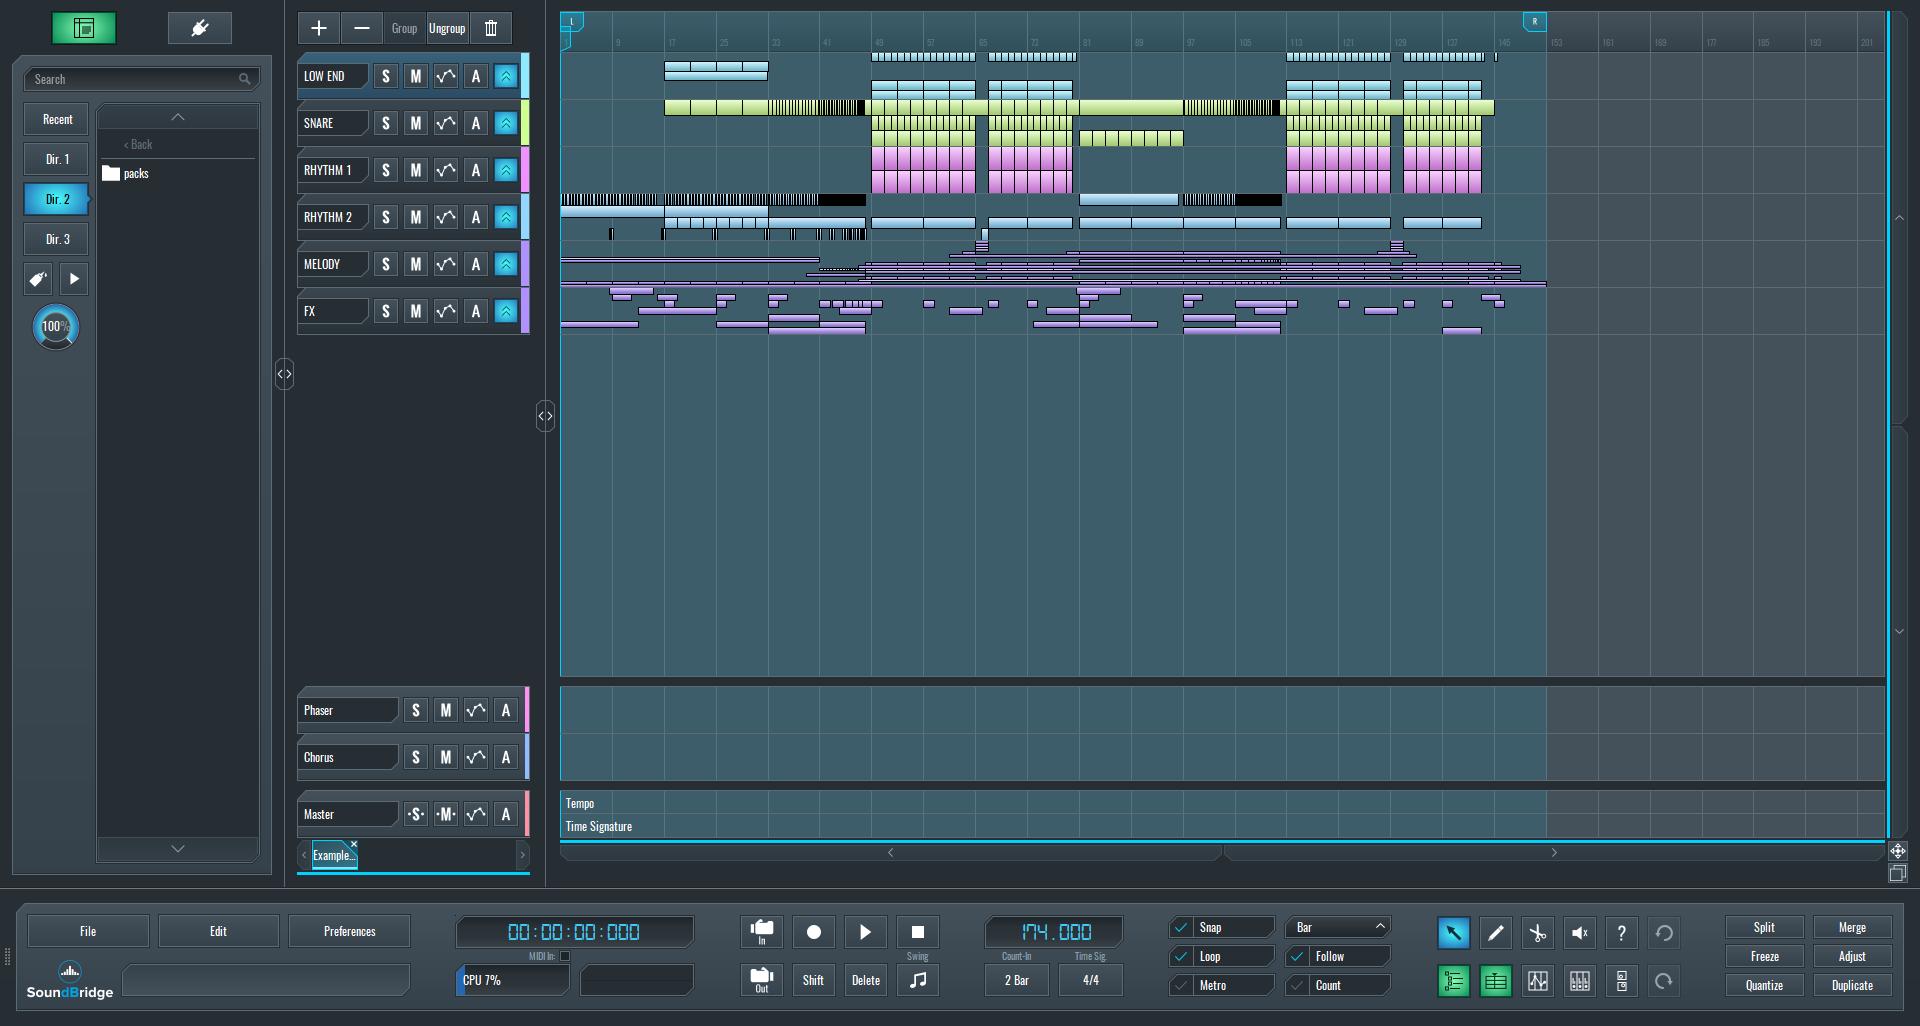 SoundBridge Widgets: Mixer (Main & Mini)